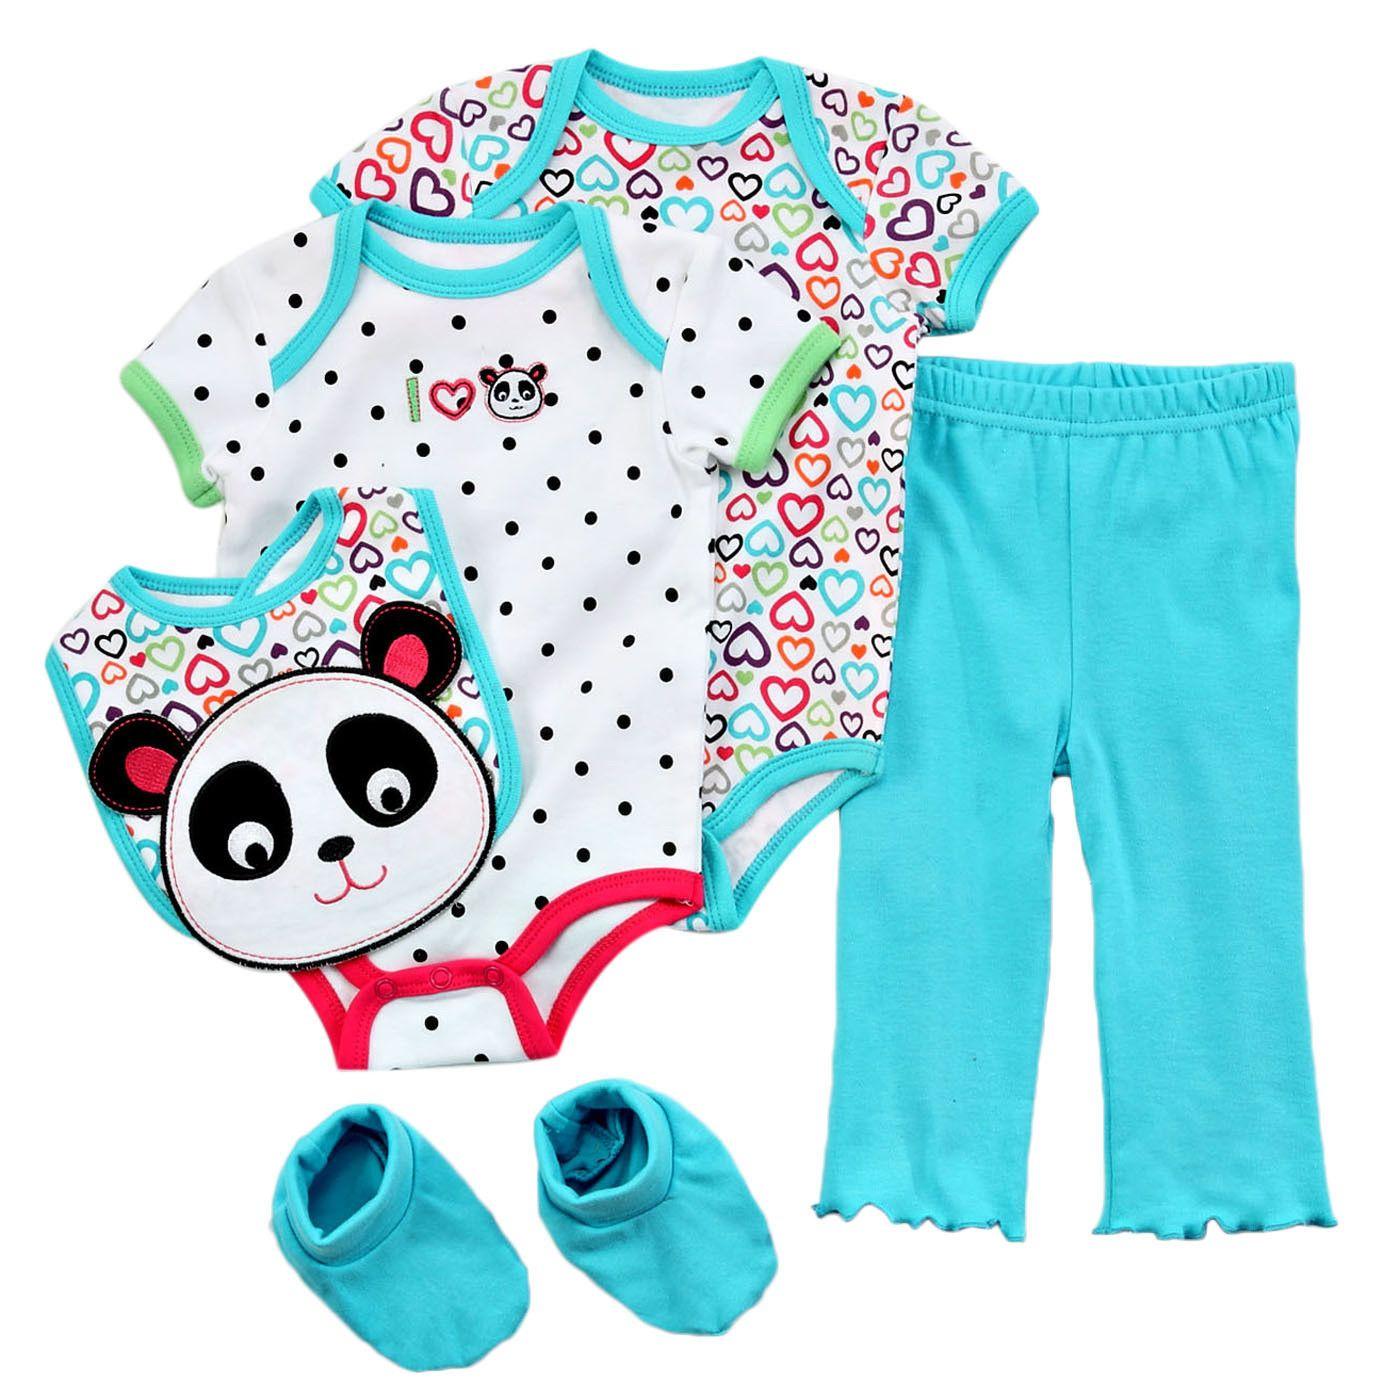 Carters Watch The Wear Newborn Girl  5 Piece Layette Set | Shopko.com